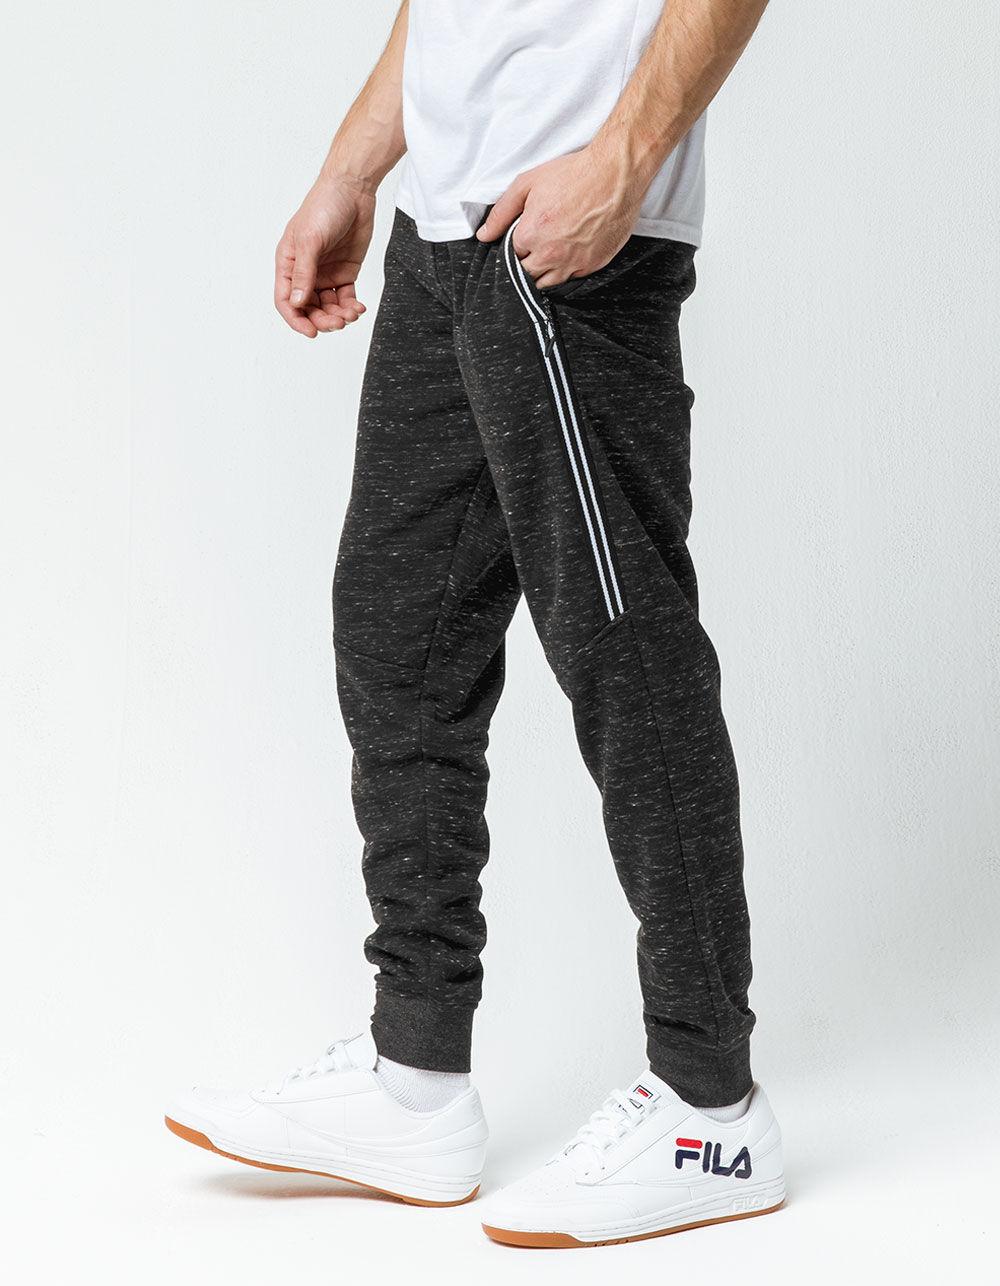 Image of BROOKLYN CLOTH SNOW FLEECE BLACK JOGGER PANTS